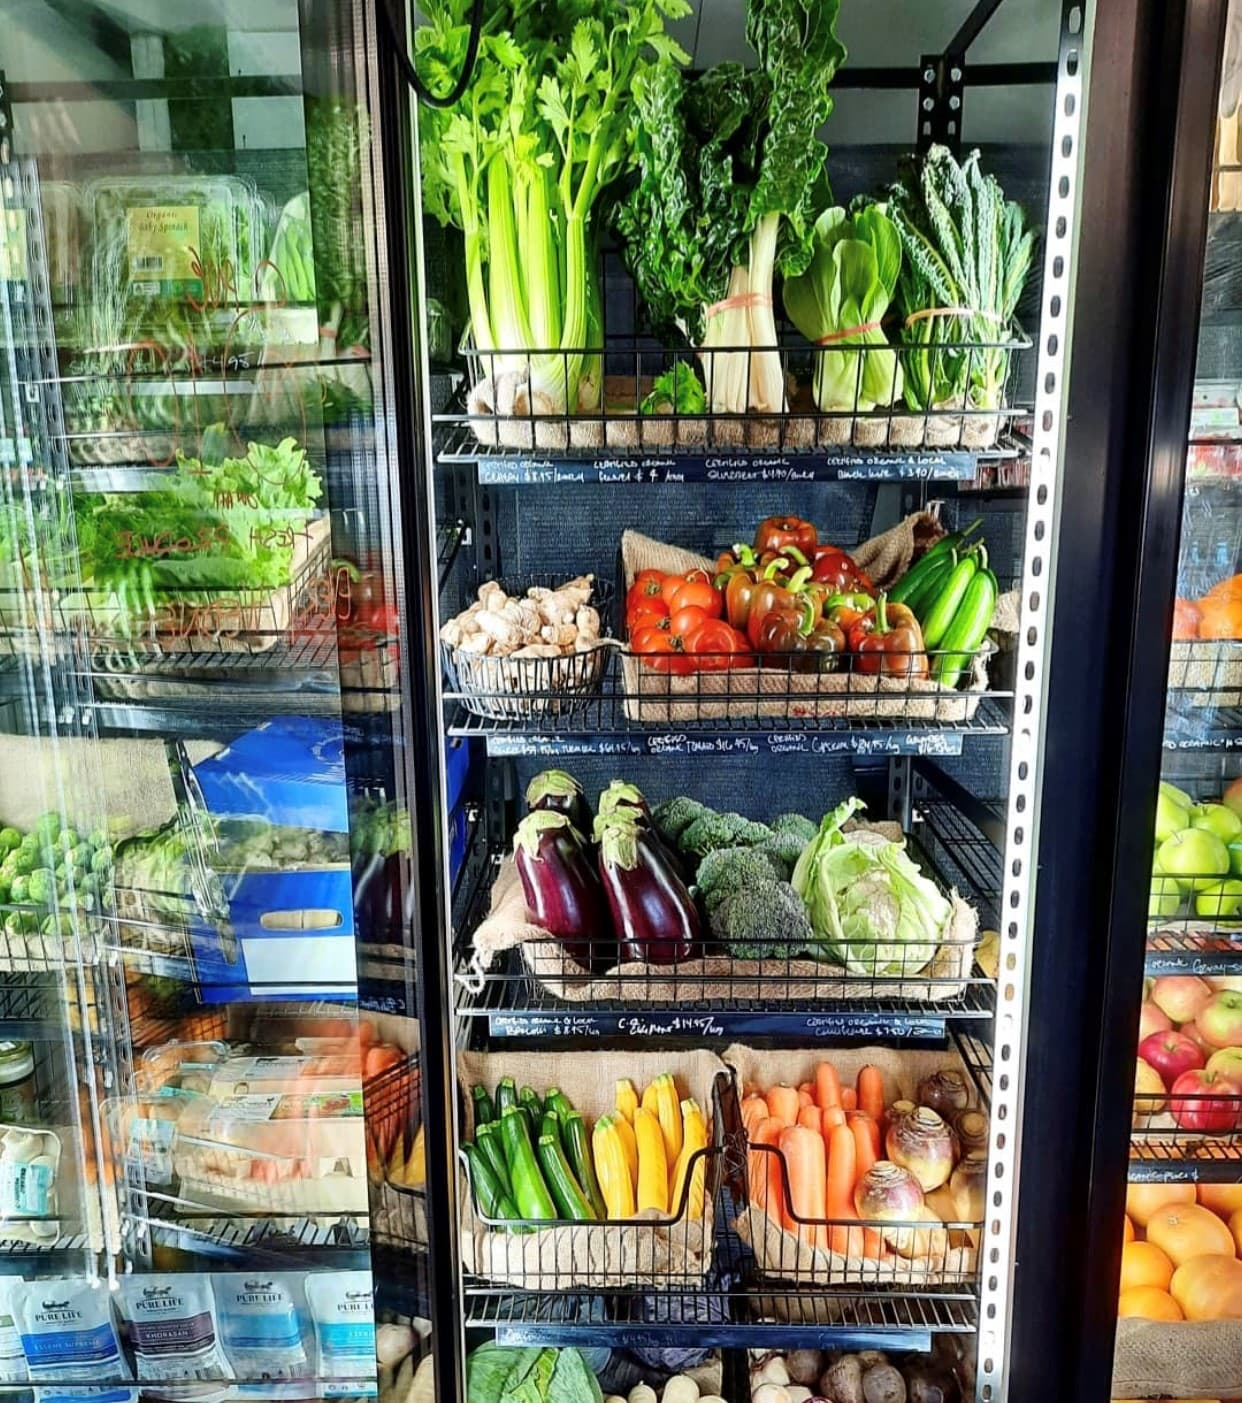 fridge full of organic produce